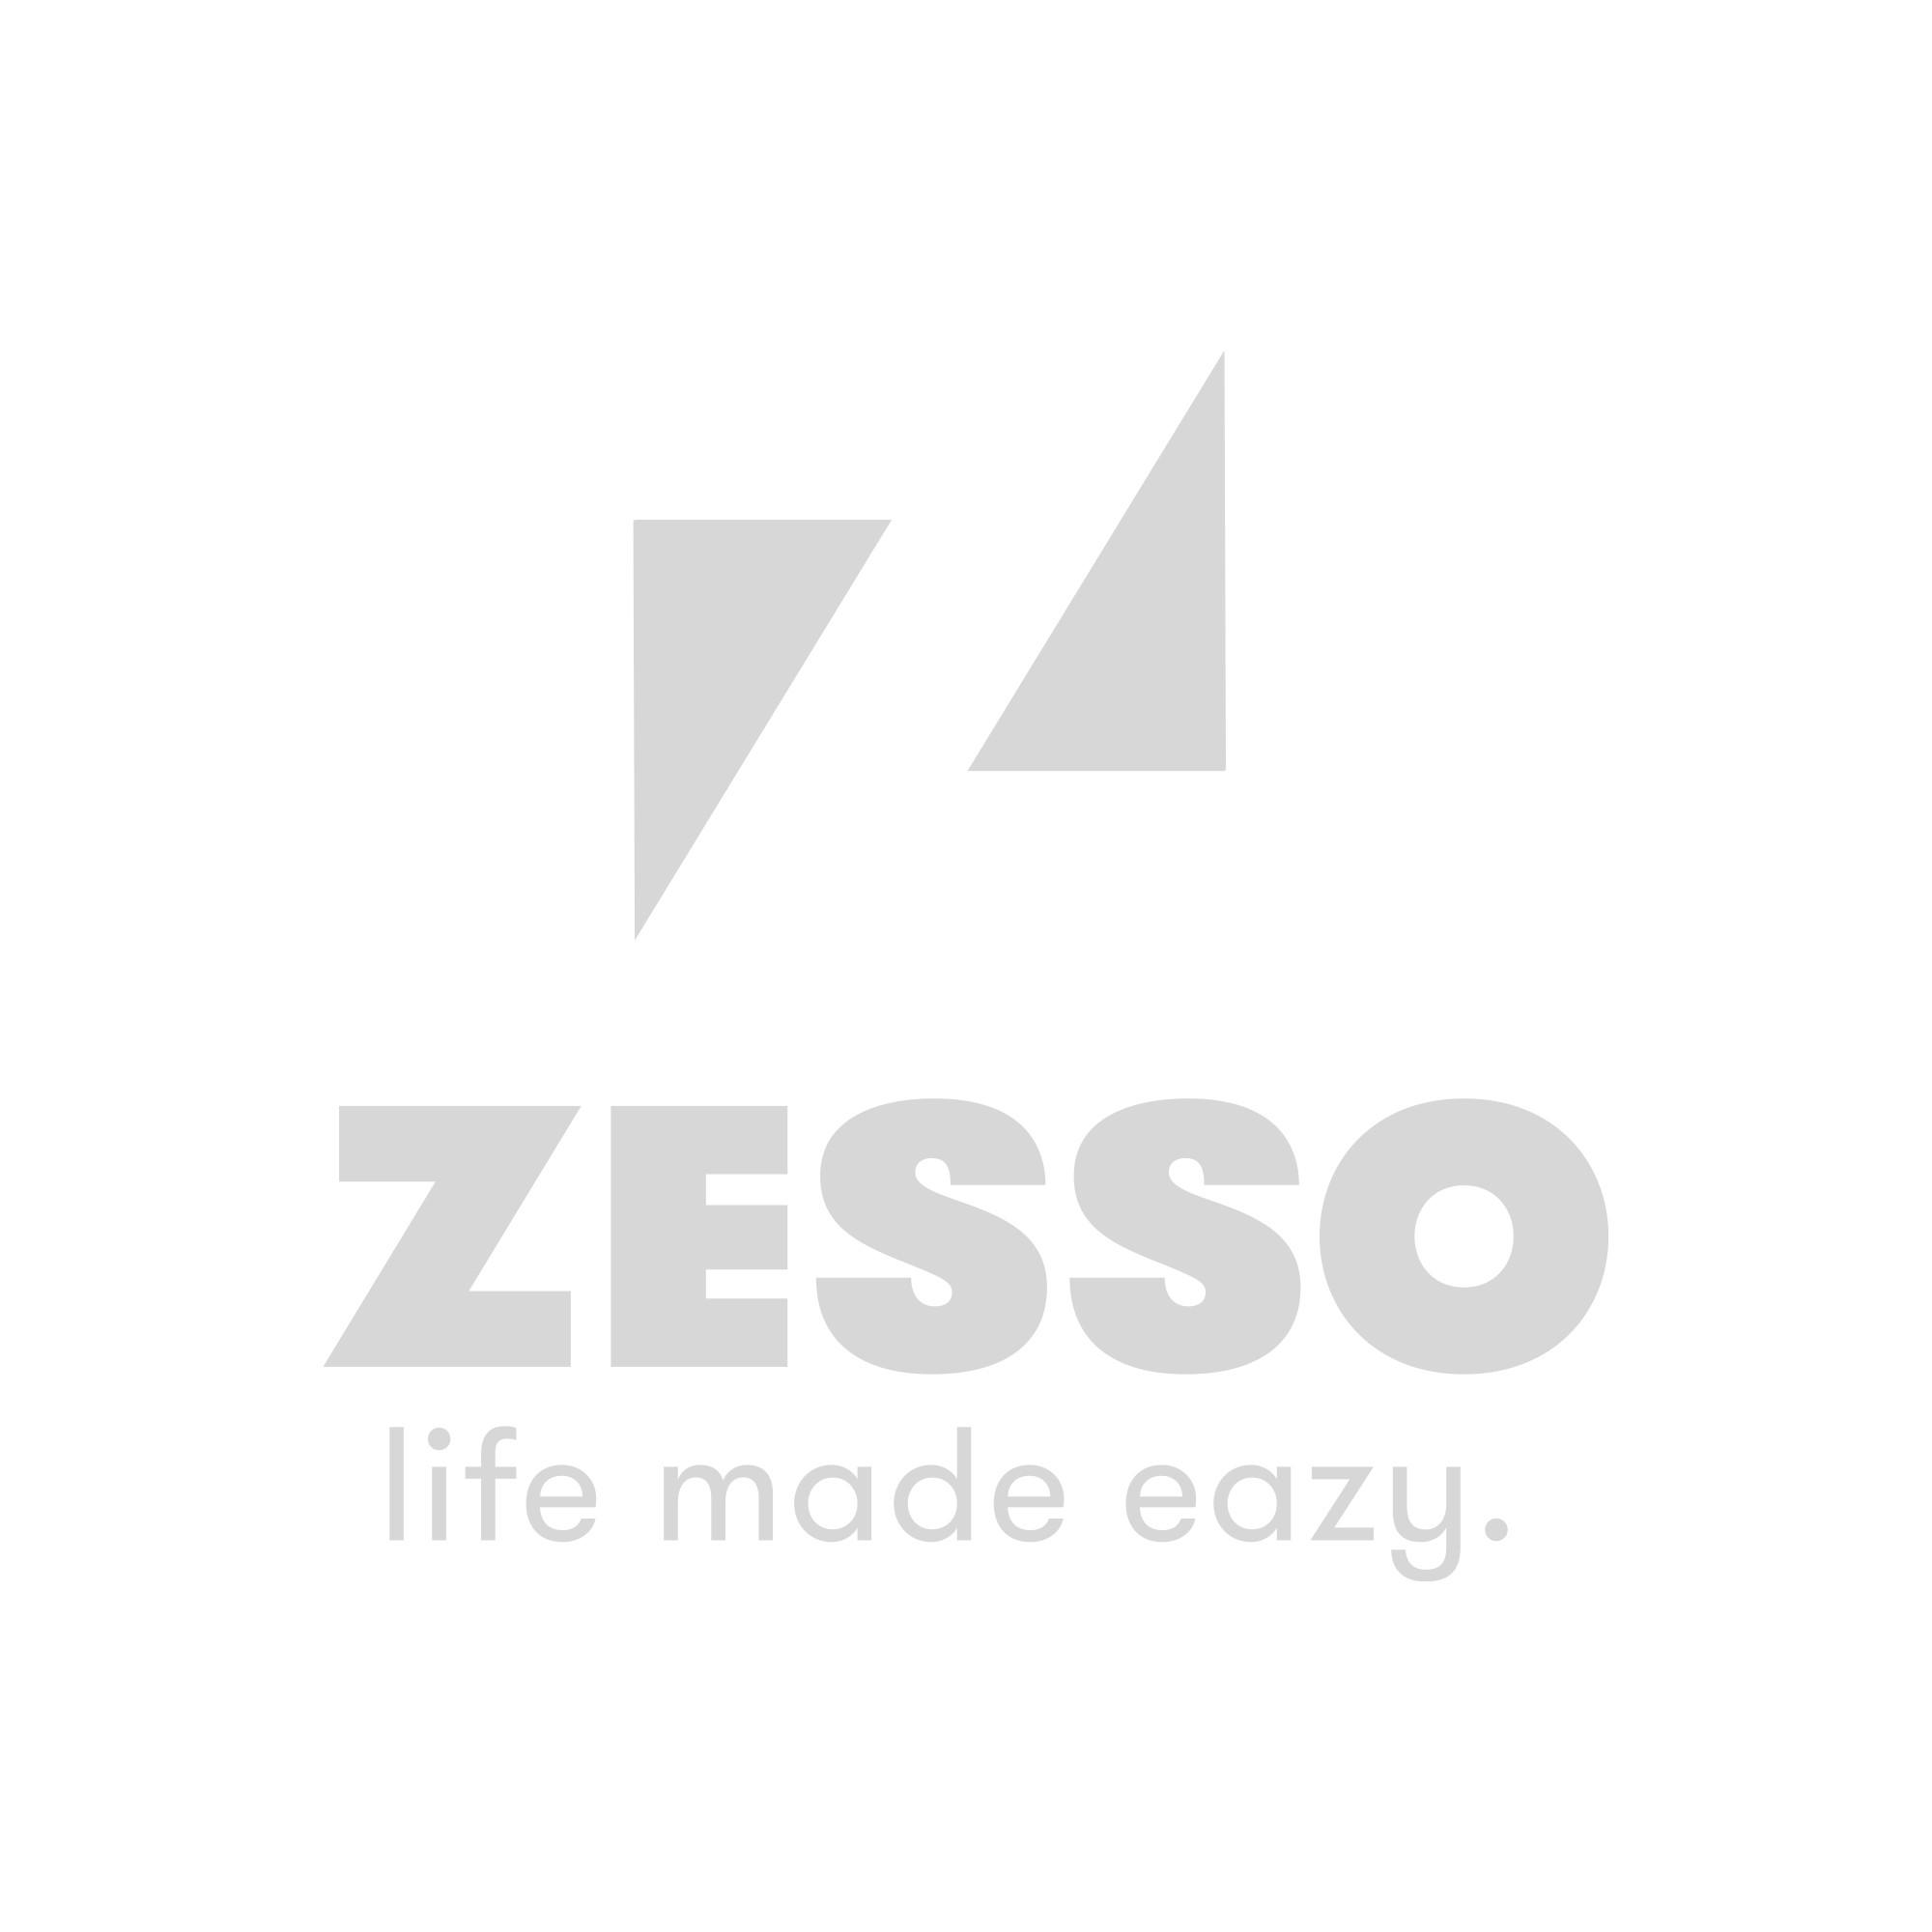 Finder Tools Ratchet & Embouts De Vissage Set 38 Pcs